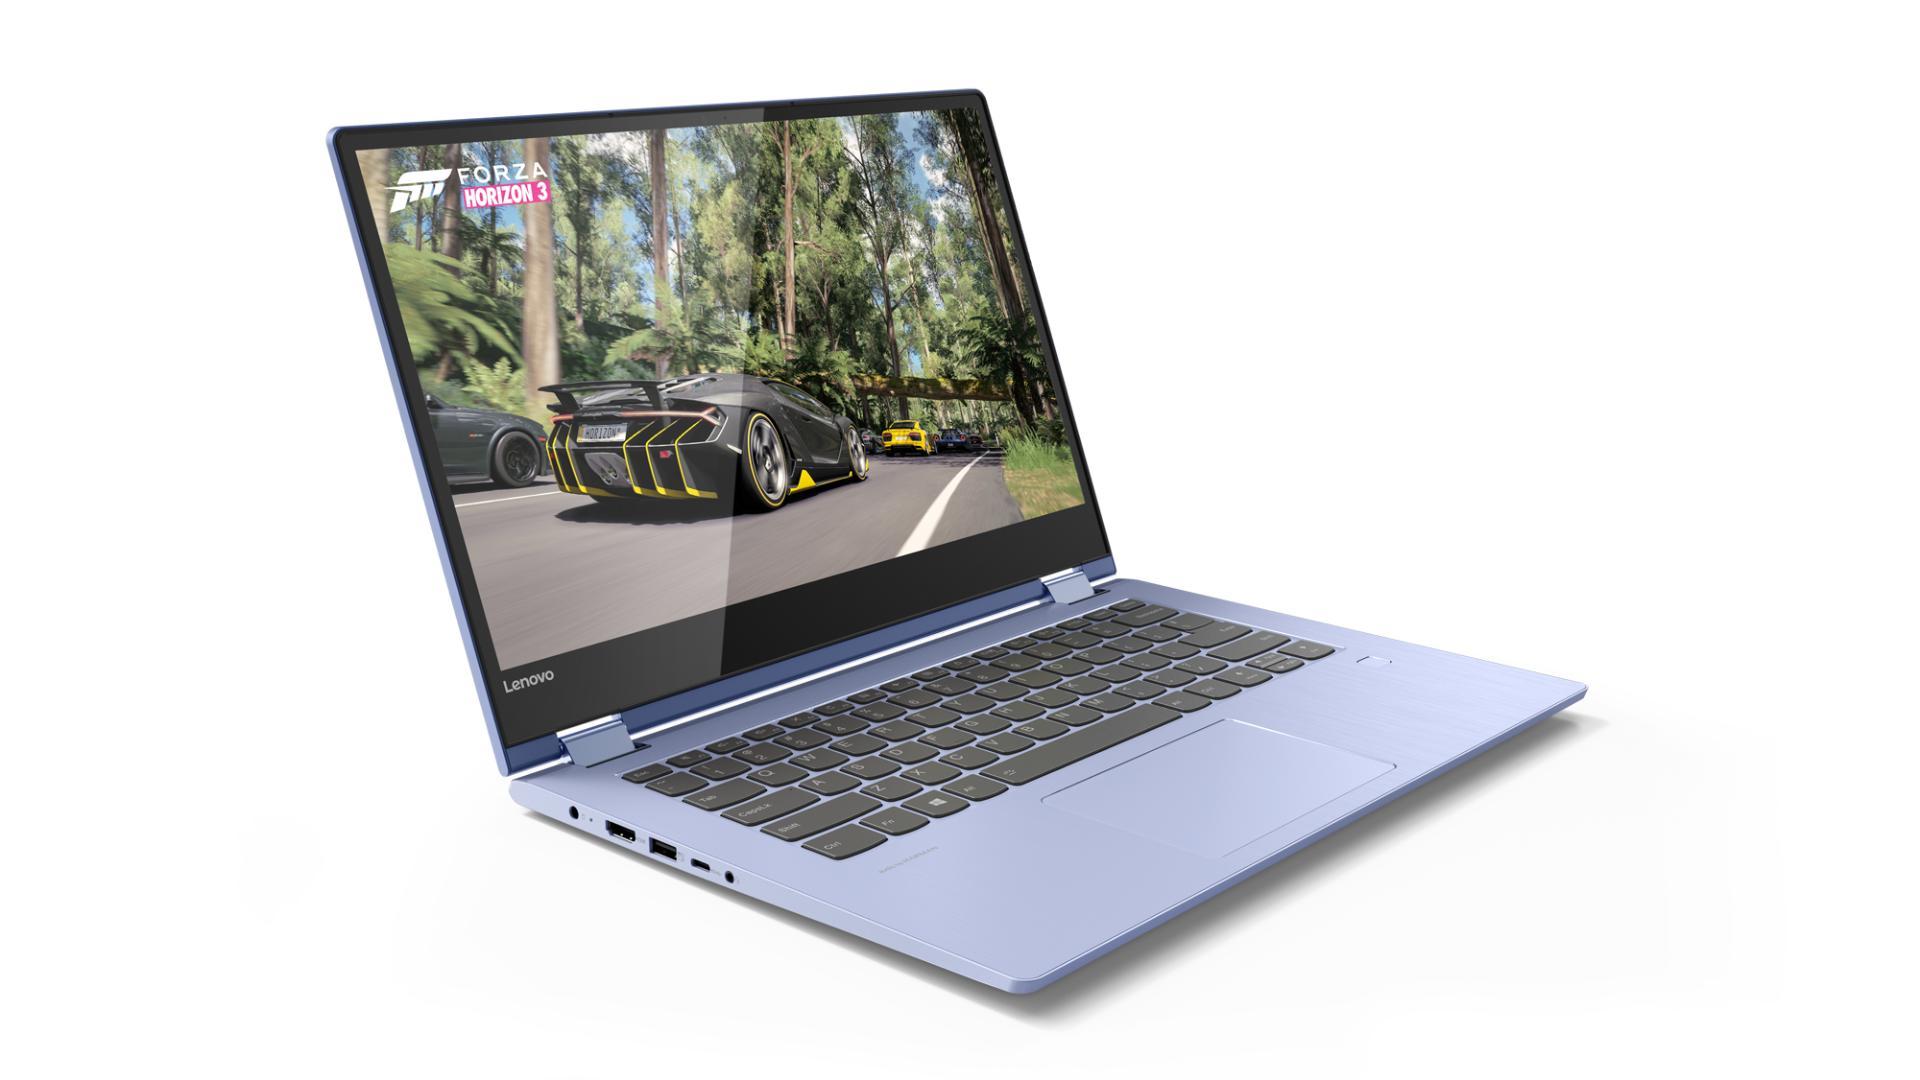 Lenovo IdeaPad 530s i7-8550U Windows 10 Home 16GB DDR4 RAM + 512GB SSD NVIDIA MX150 DDR5 2GB Graphics 14 FHD  Liquid Blue